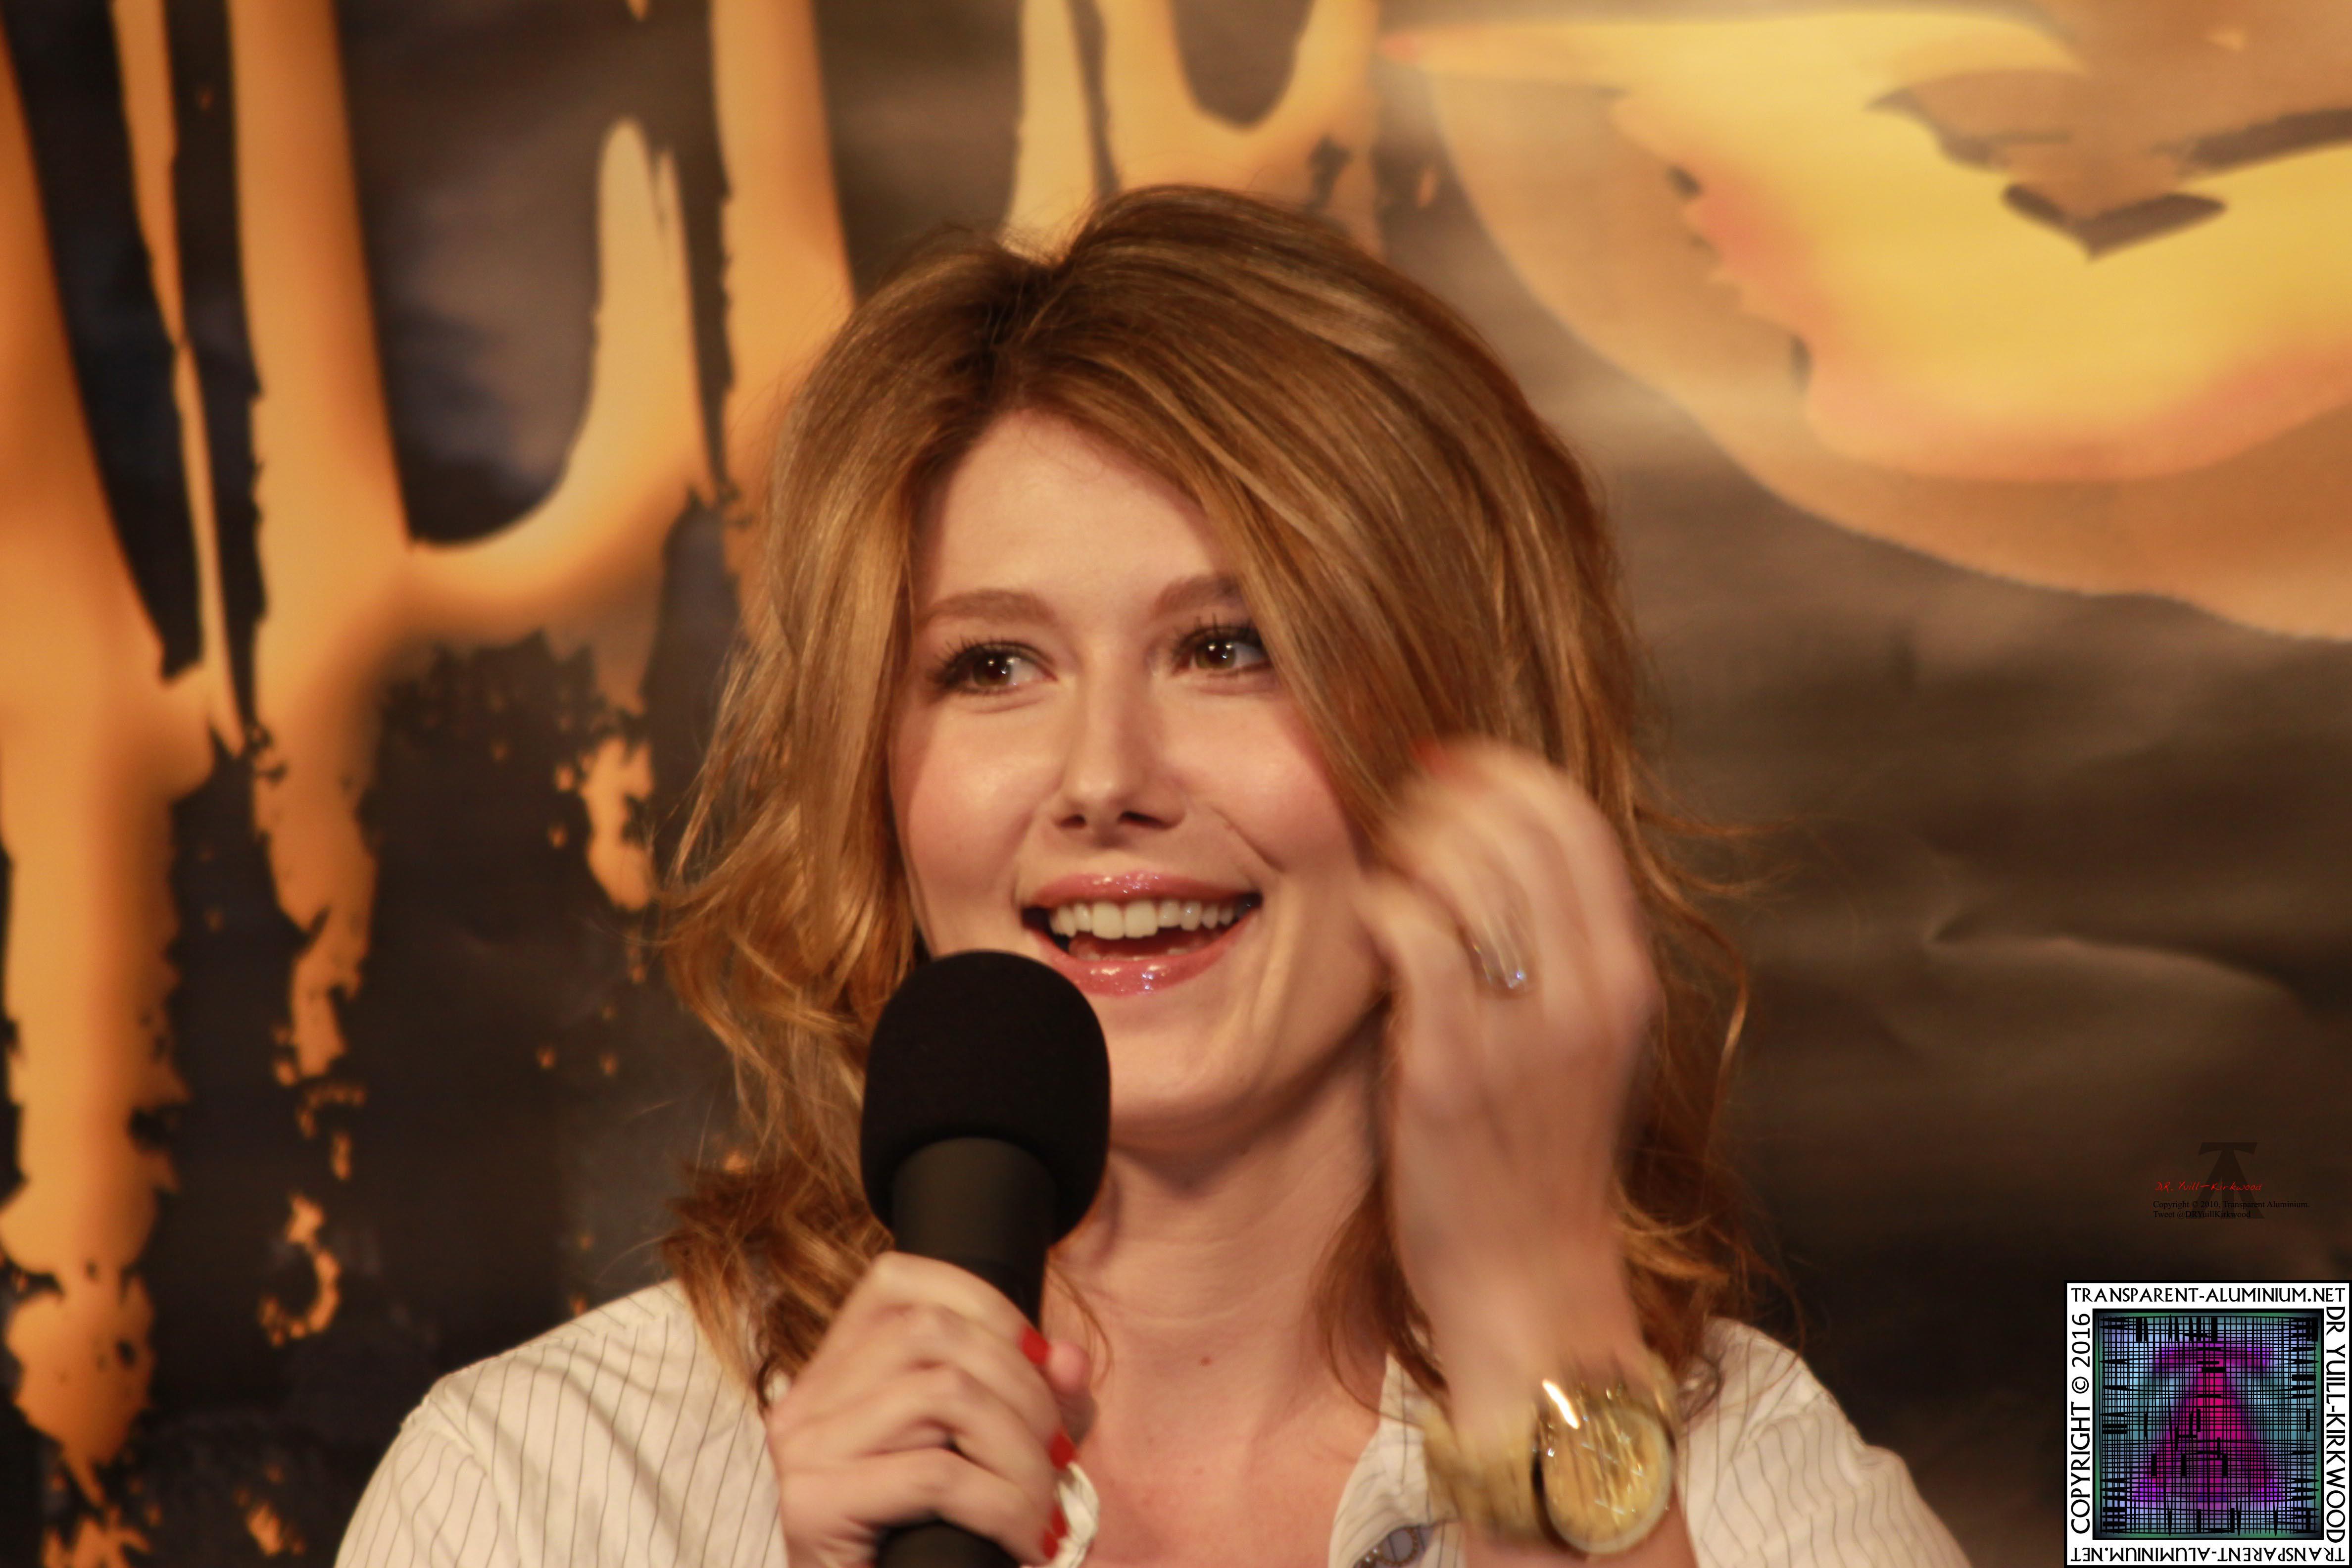 Hallowhedon2 2010 – Just Jewel Staite